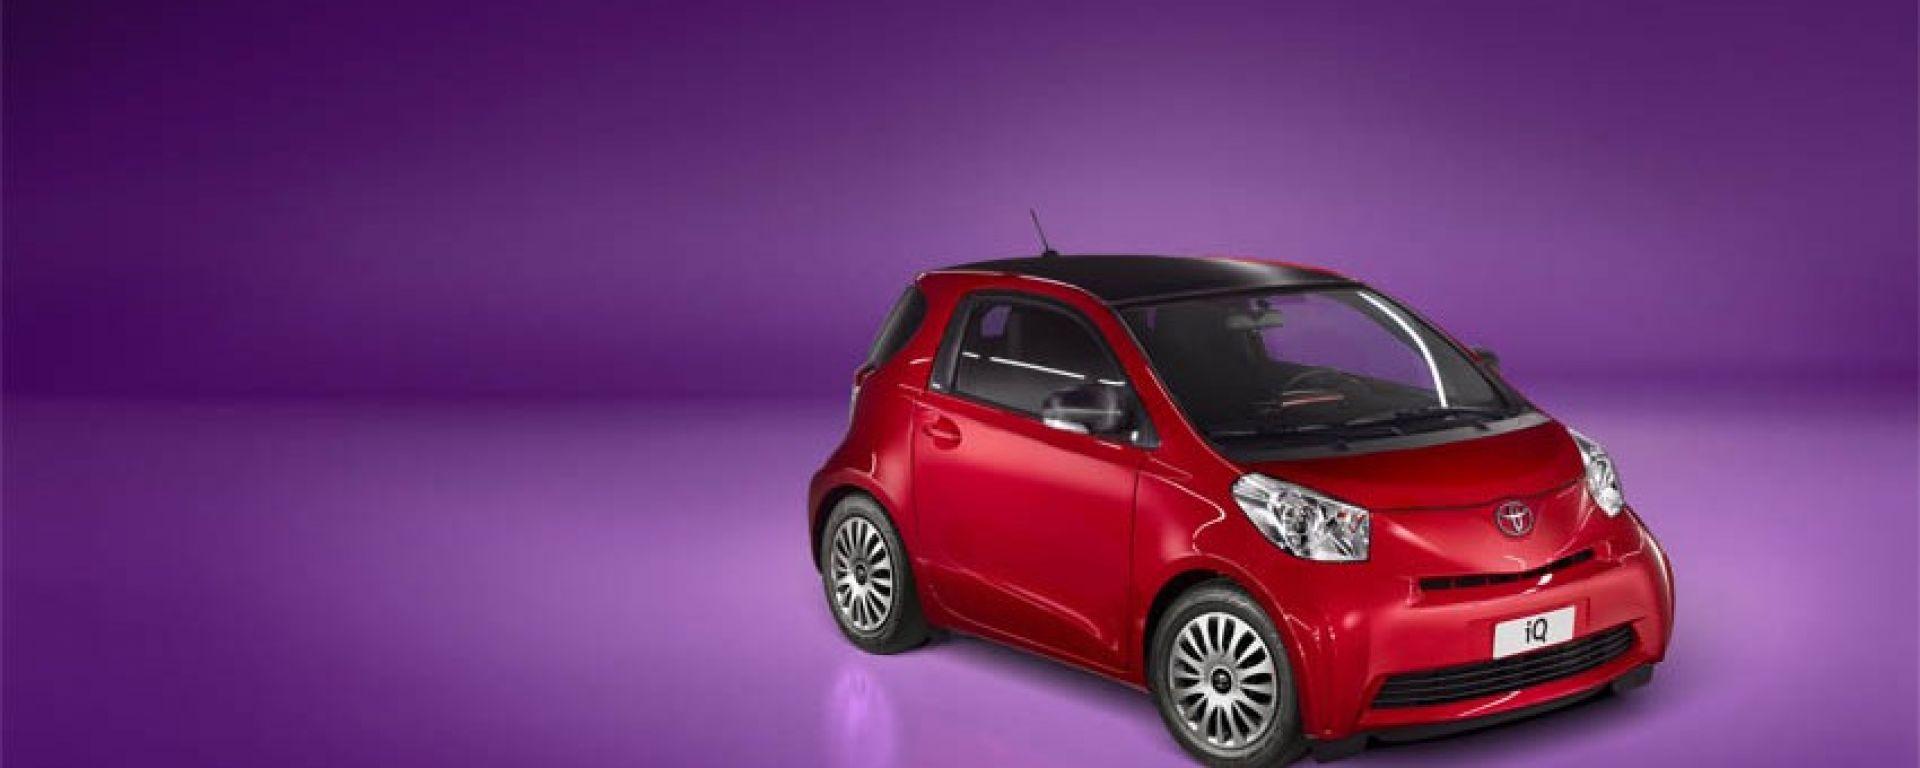 Toyota iQ Trend